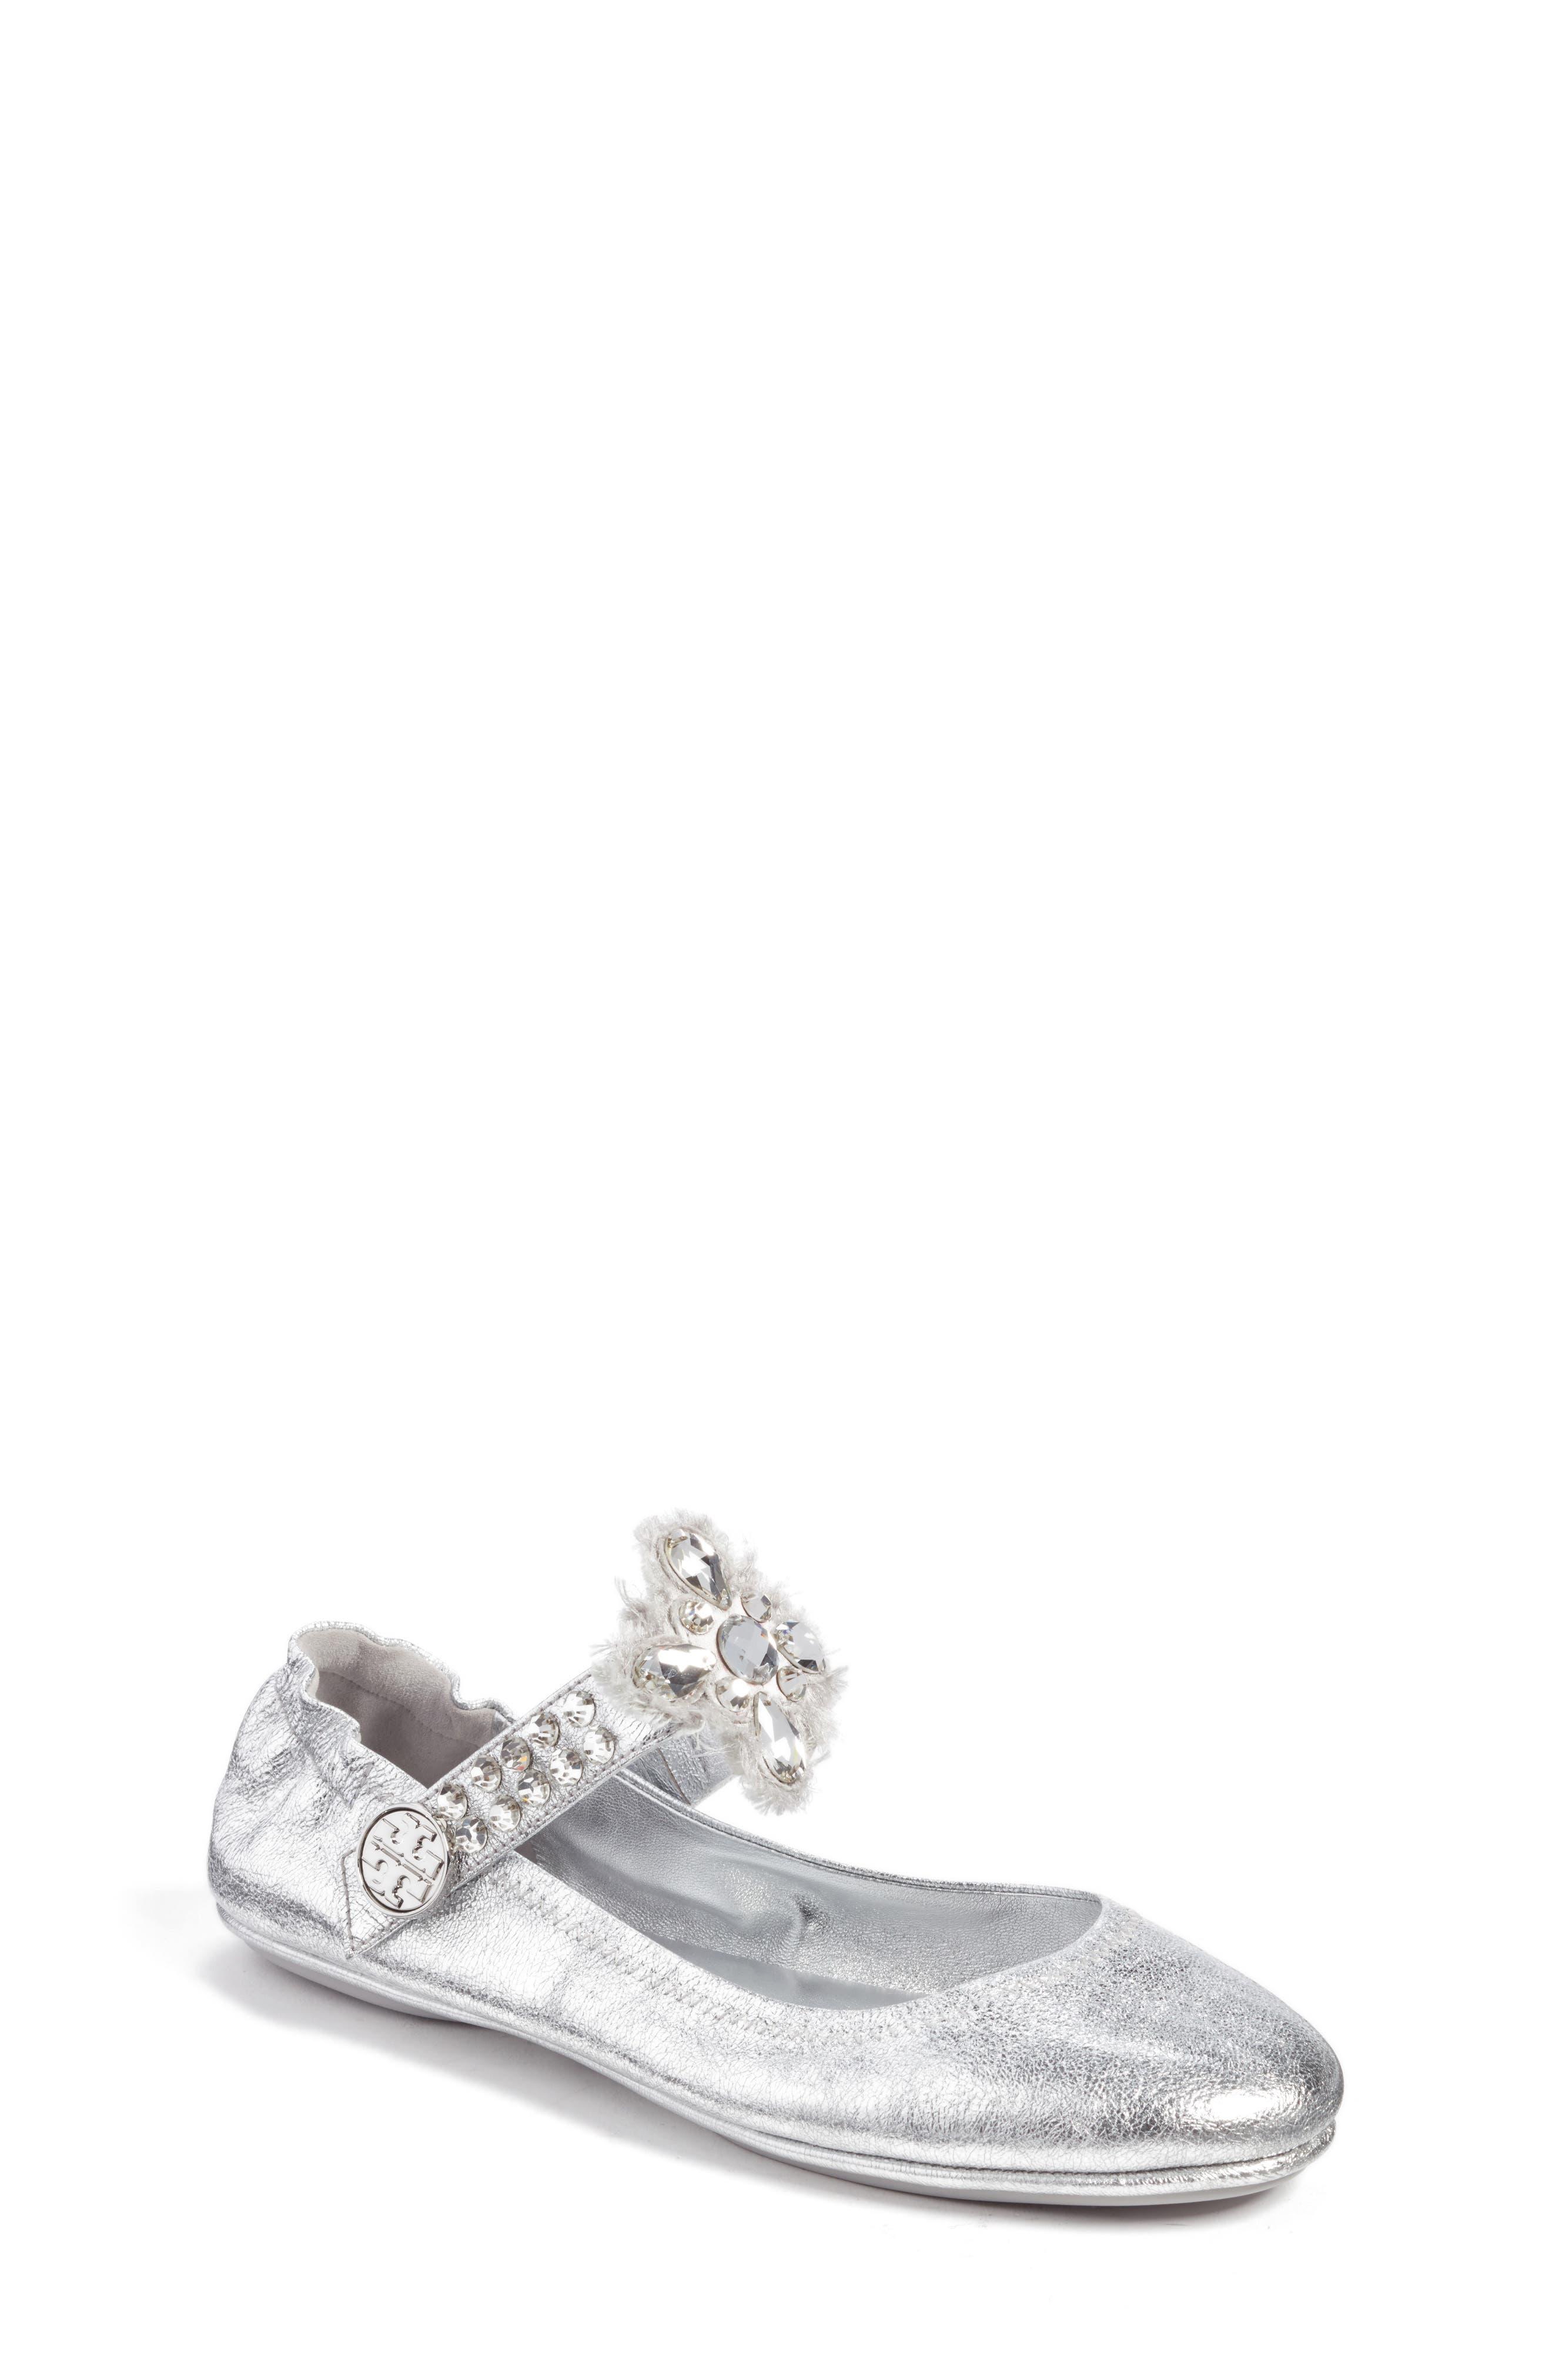 Minnie Embellished Convertible Strap Ballet Flat,                             Main thumbnail 2, color,